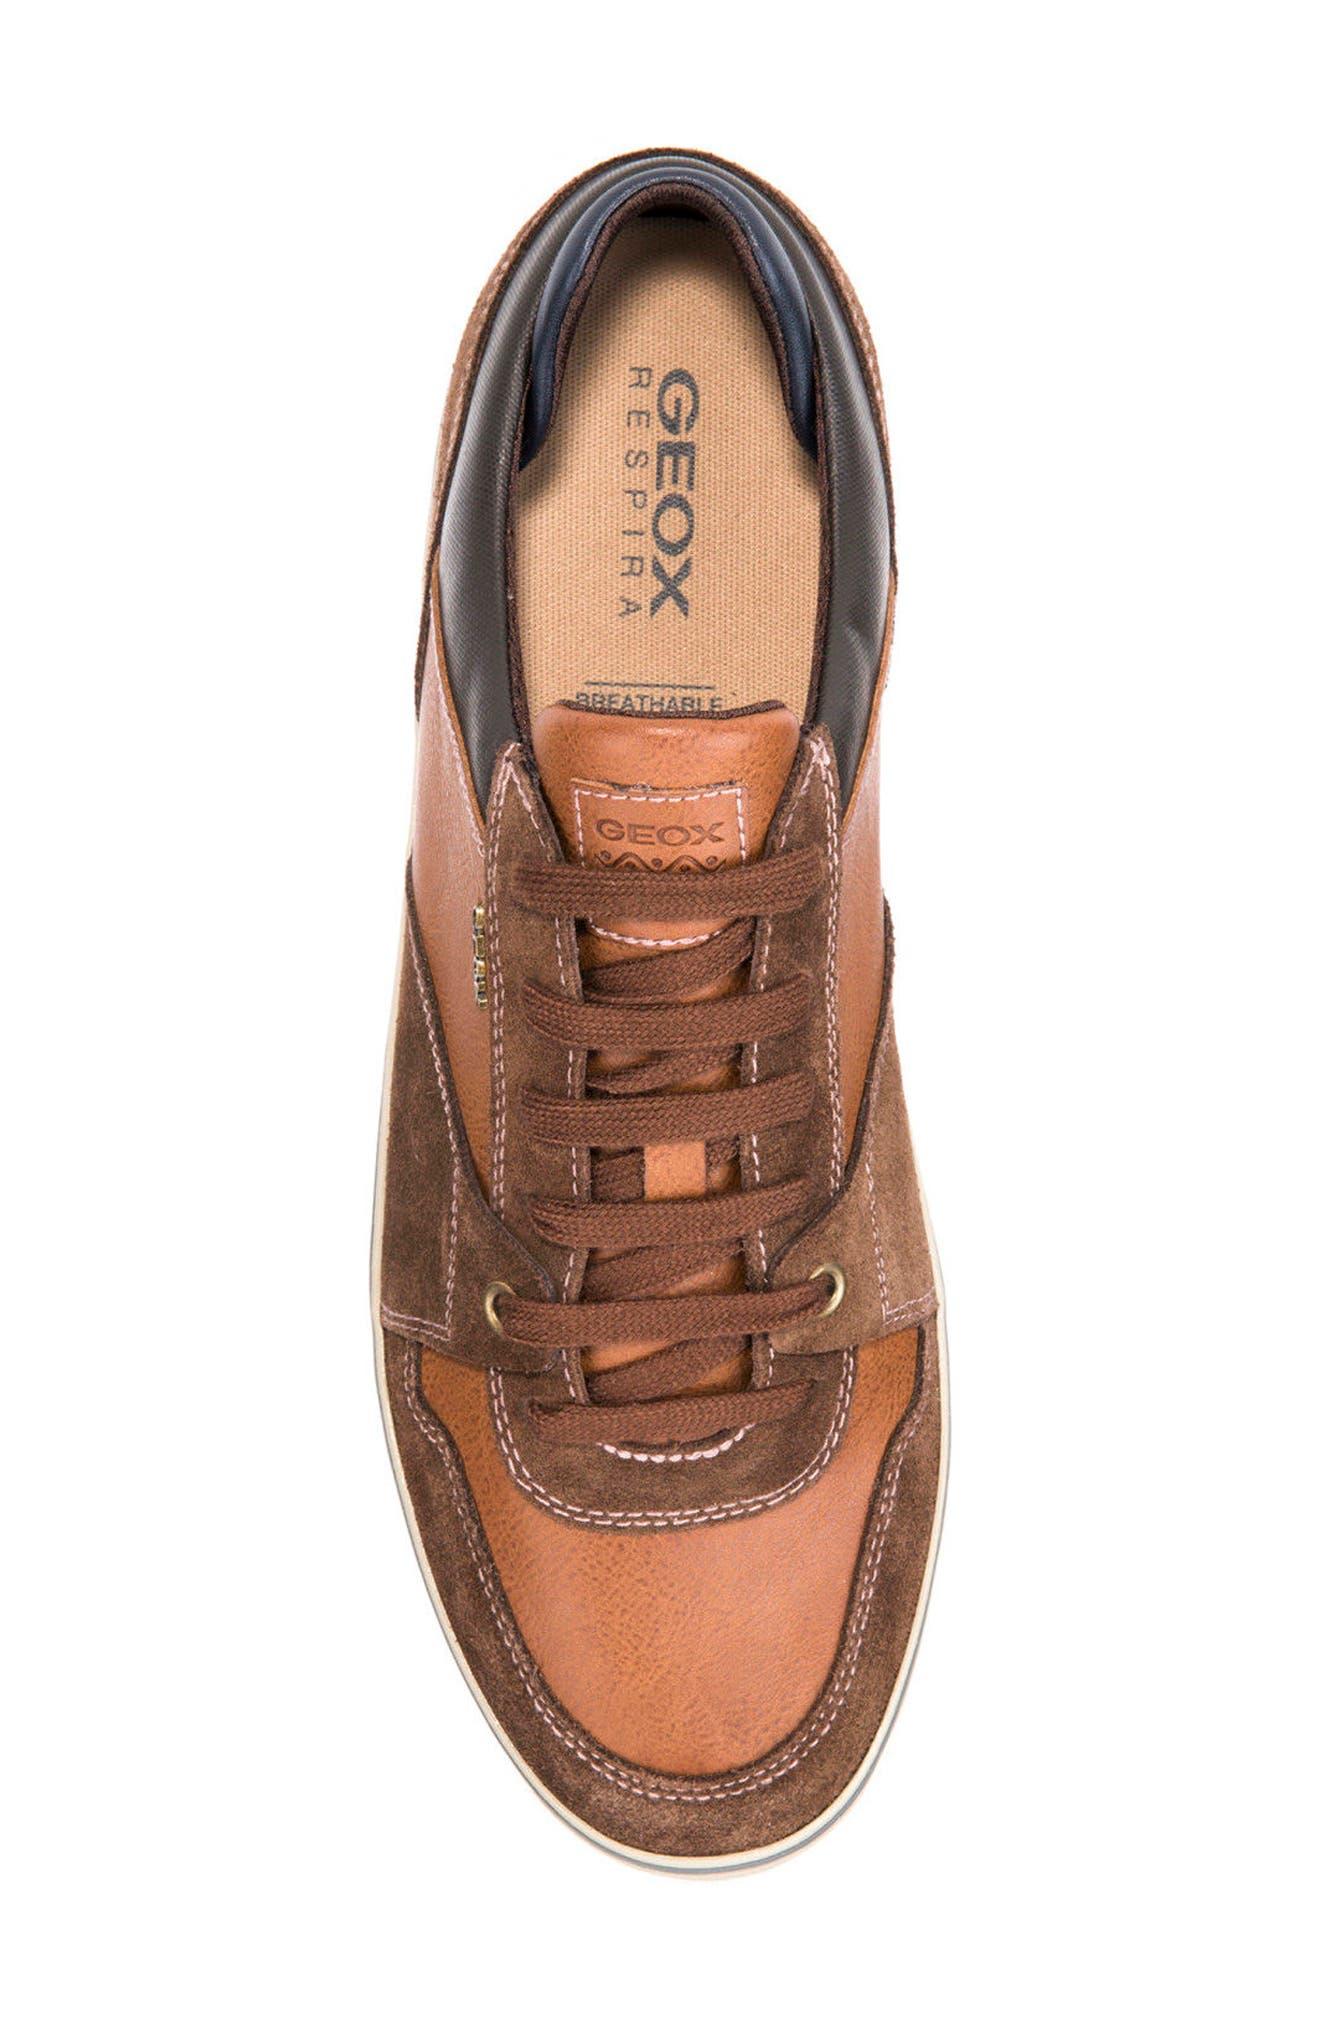 Box 27 Low-Top Sneaker,                             Alternate thumbnail 5, color,                             Ebony/ Brown Cotto